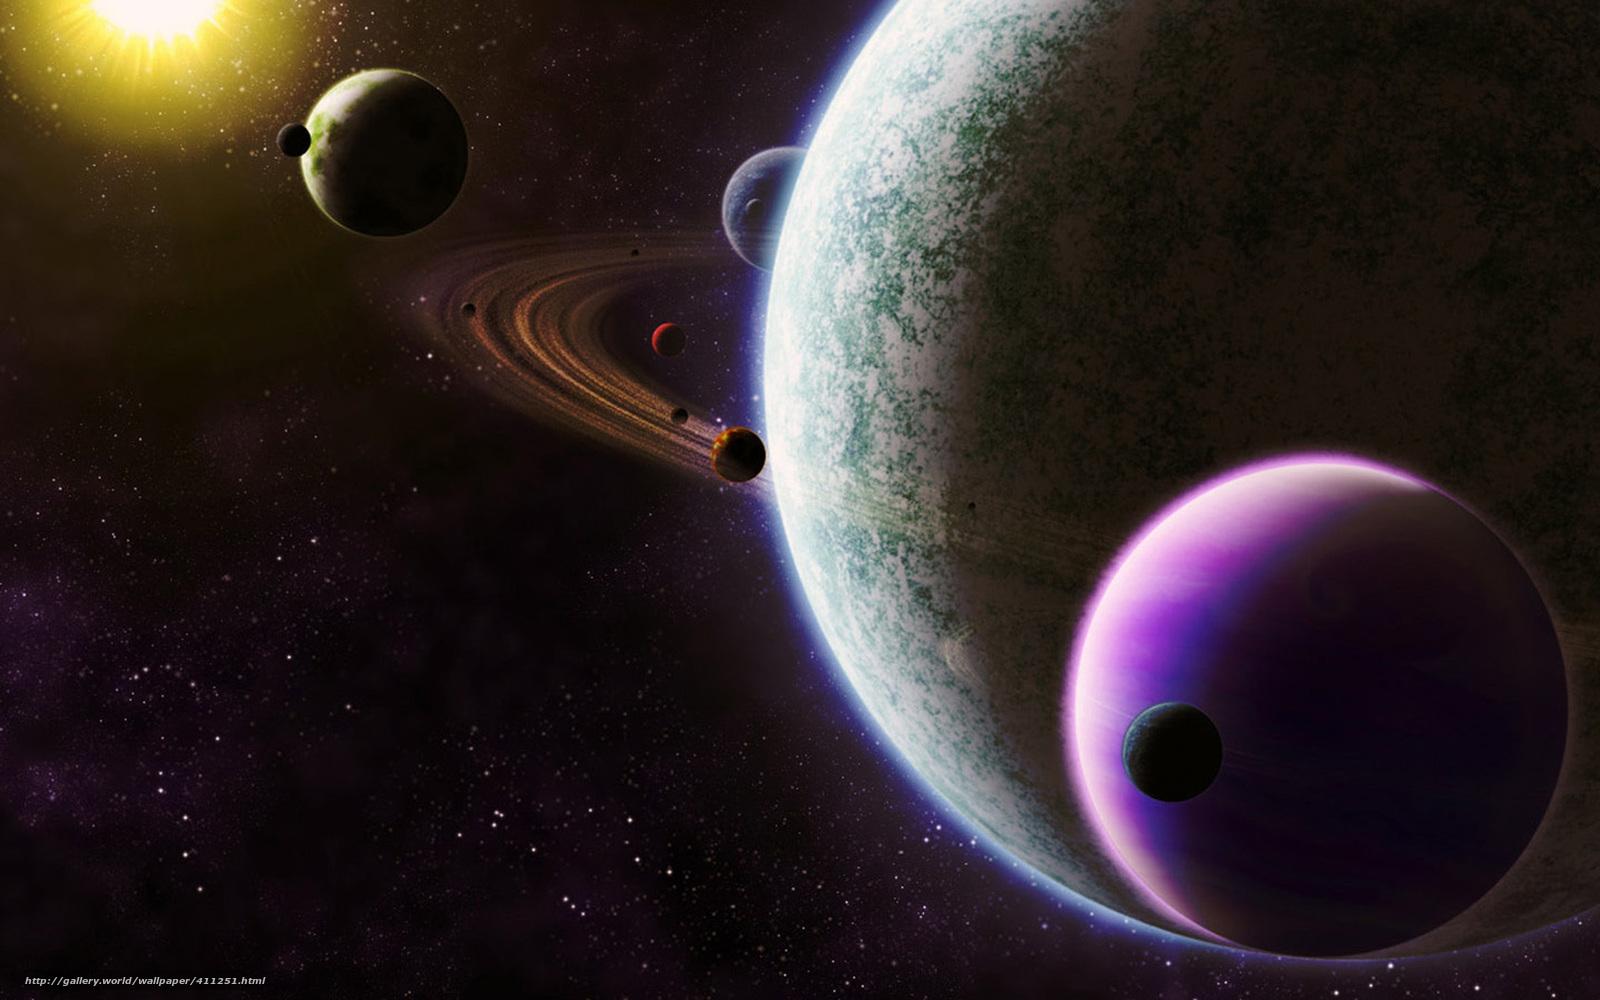 Скачать обои фото картинку на тему планета, спутники, кольца, звезда